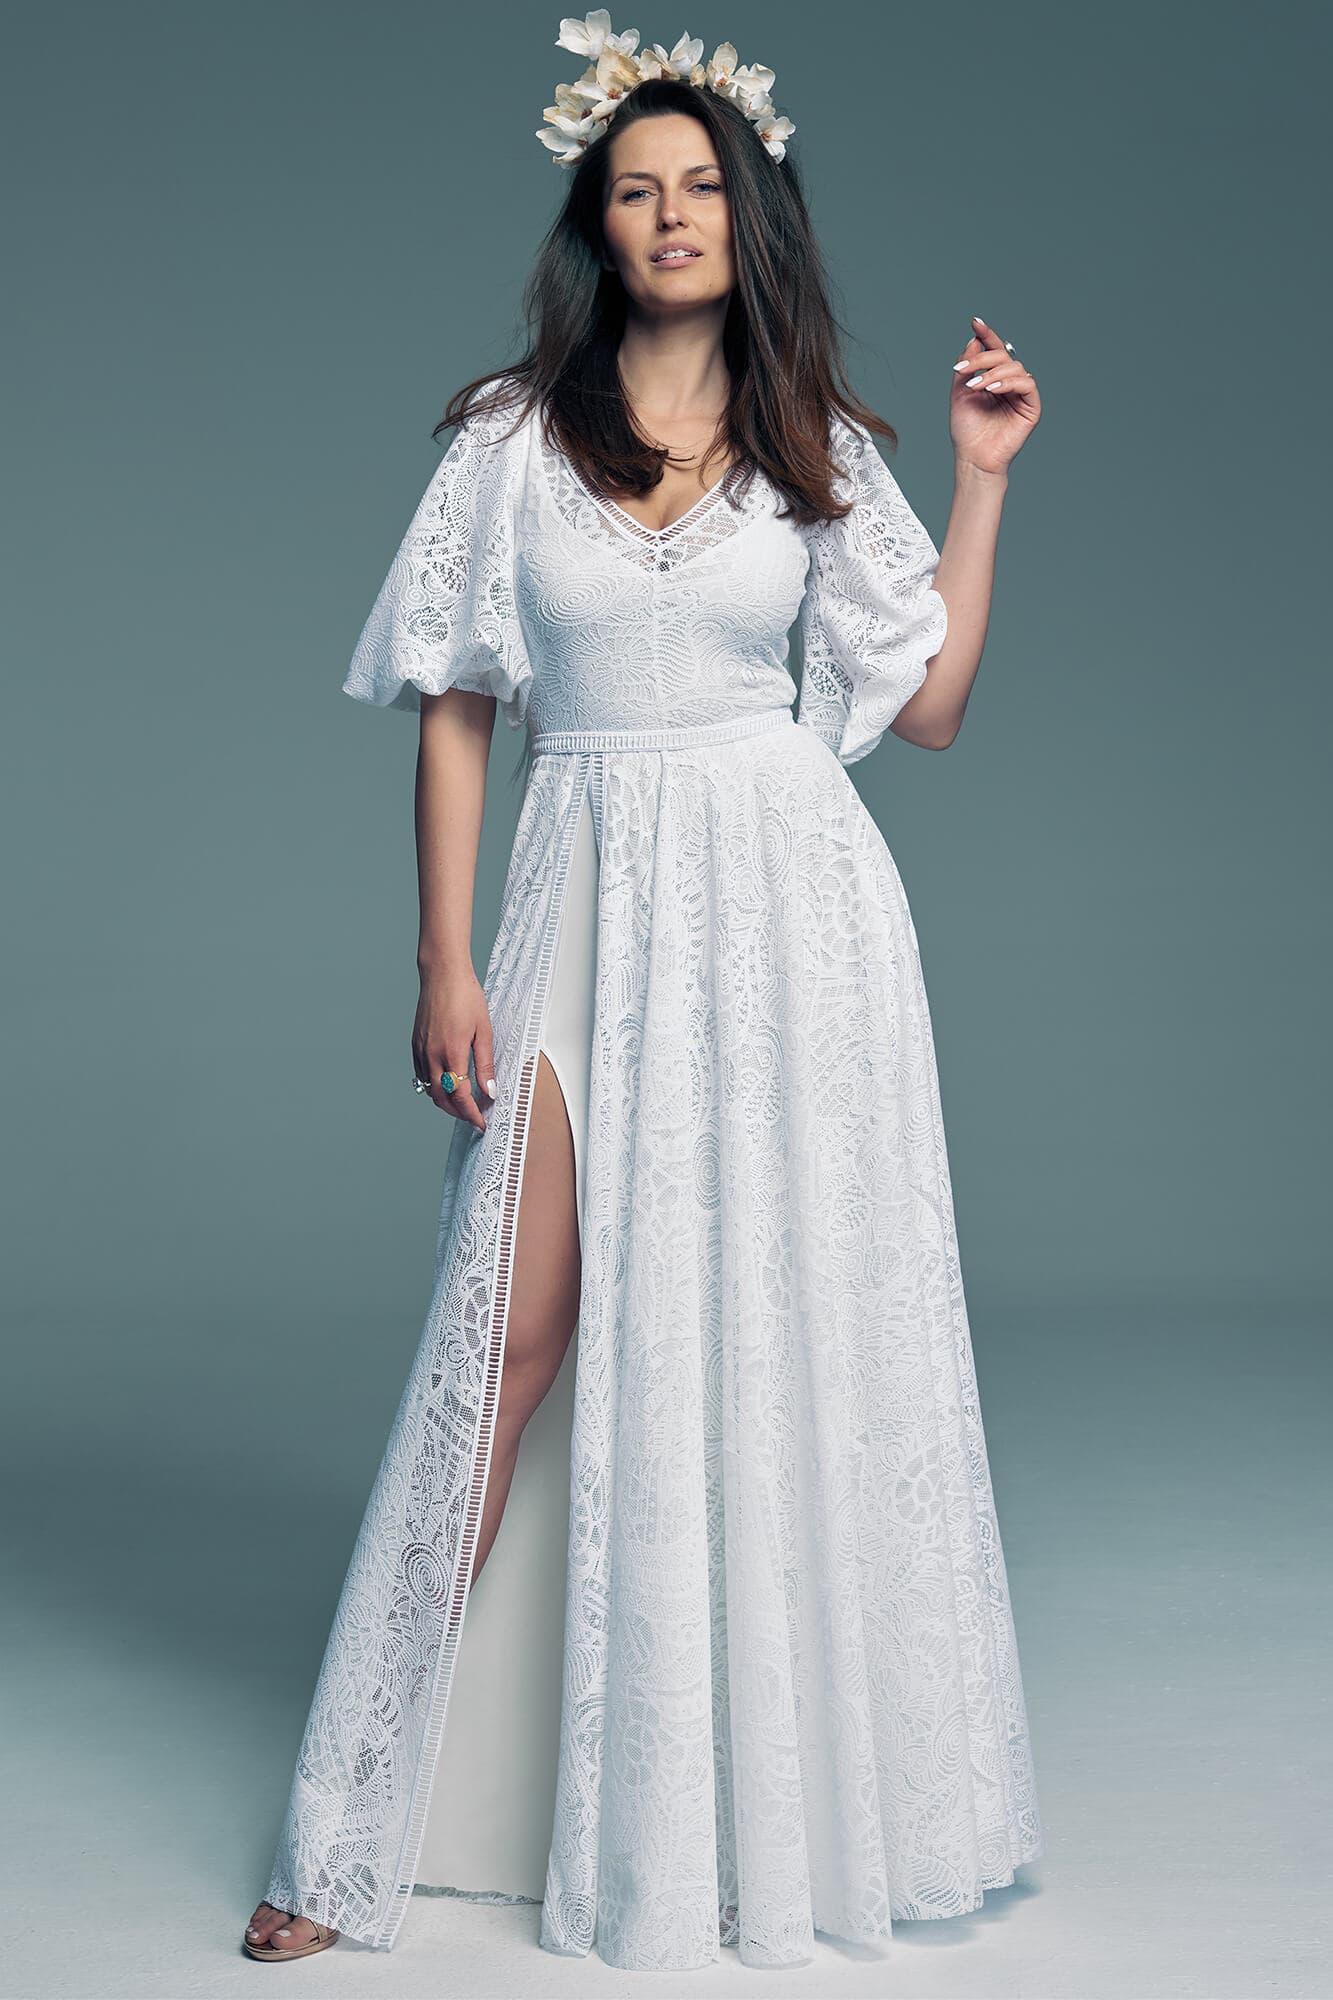 Piękna suknia ślubna z rękawami i seksownym rozporkiem Santorini 9